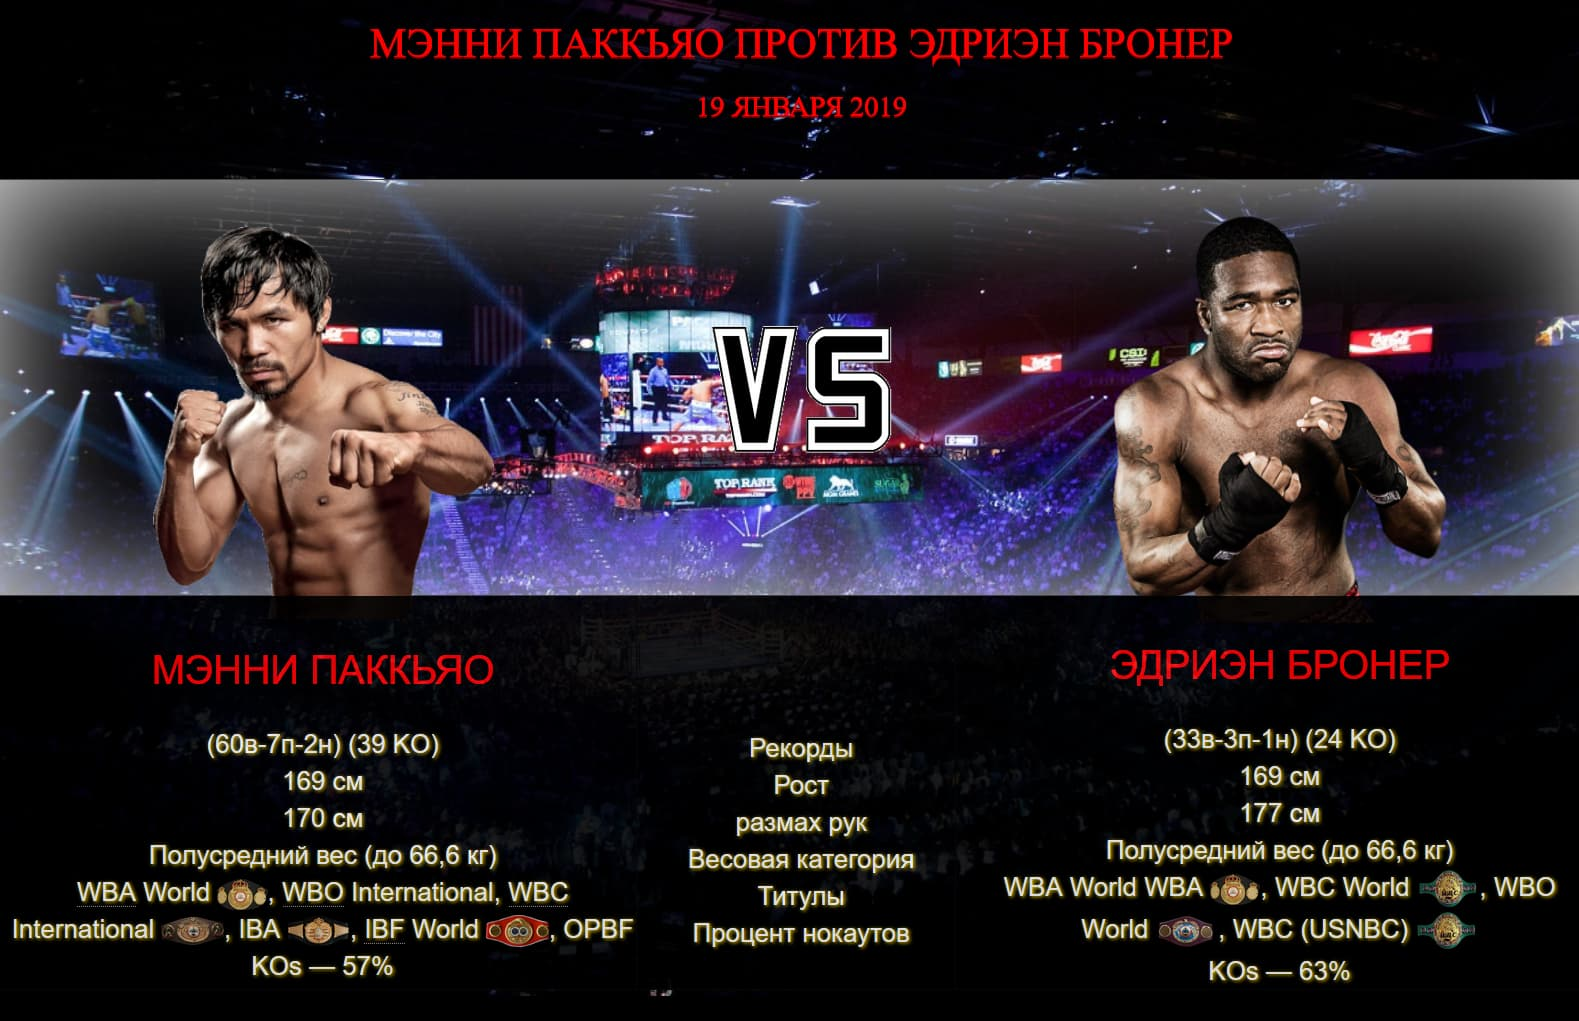 Афиша — бой Мэнни Паккьяо против Эдриэн Бронер | Manny Pacquiao vs Adrien Broner